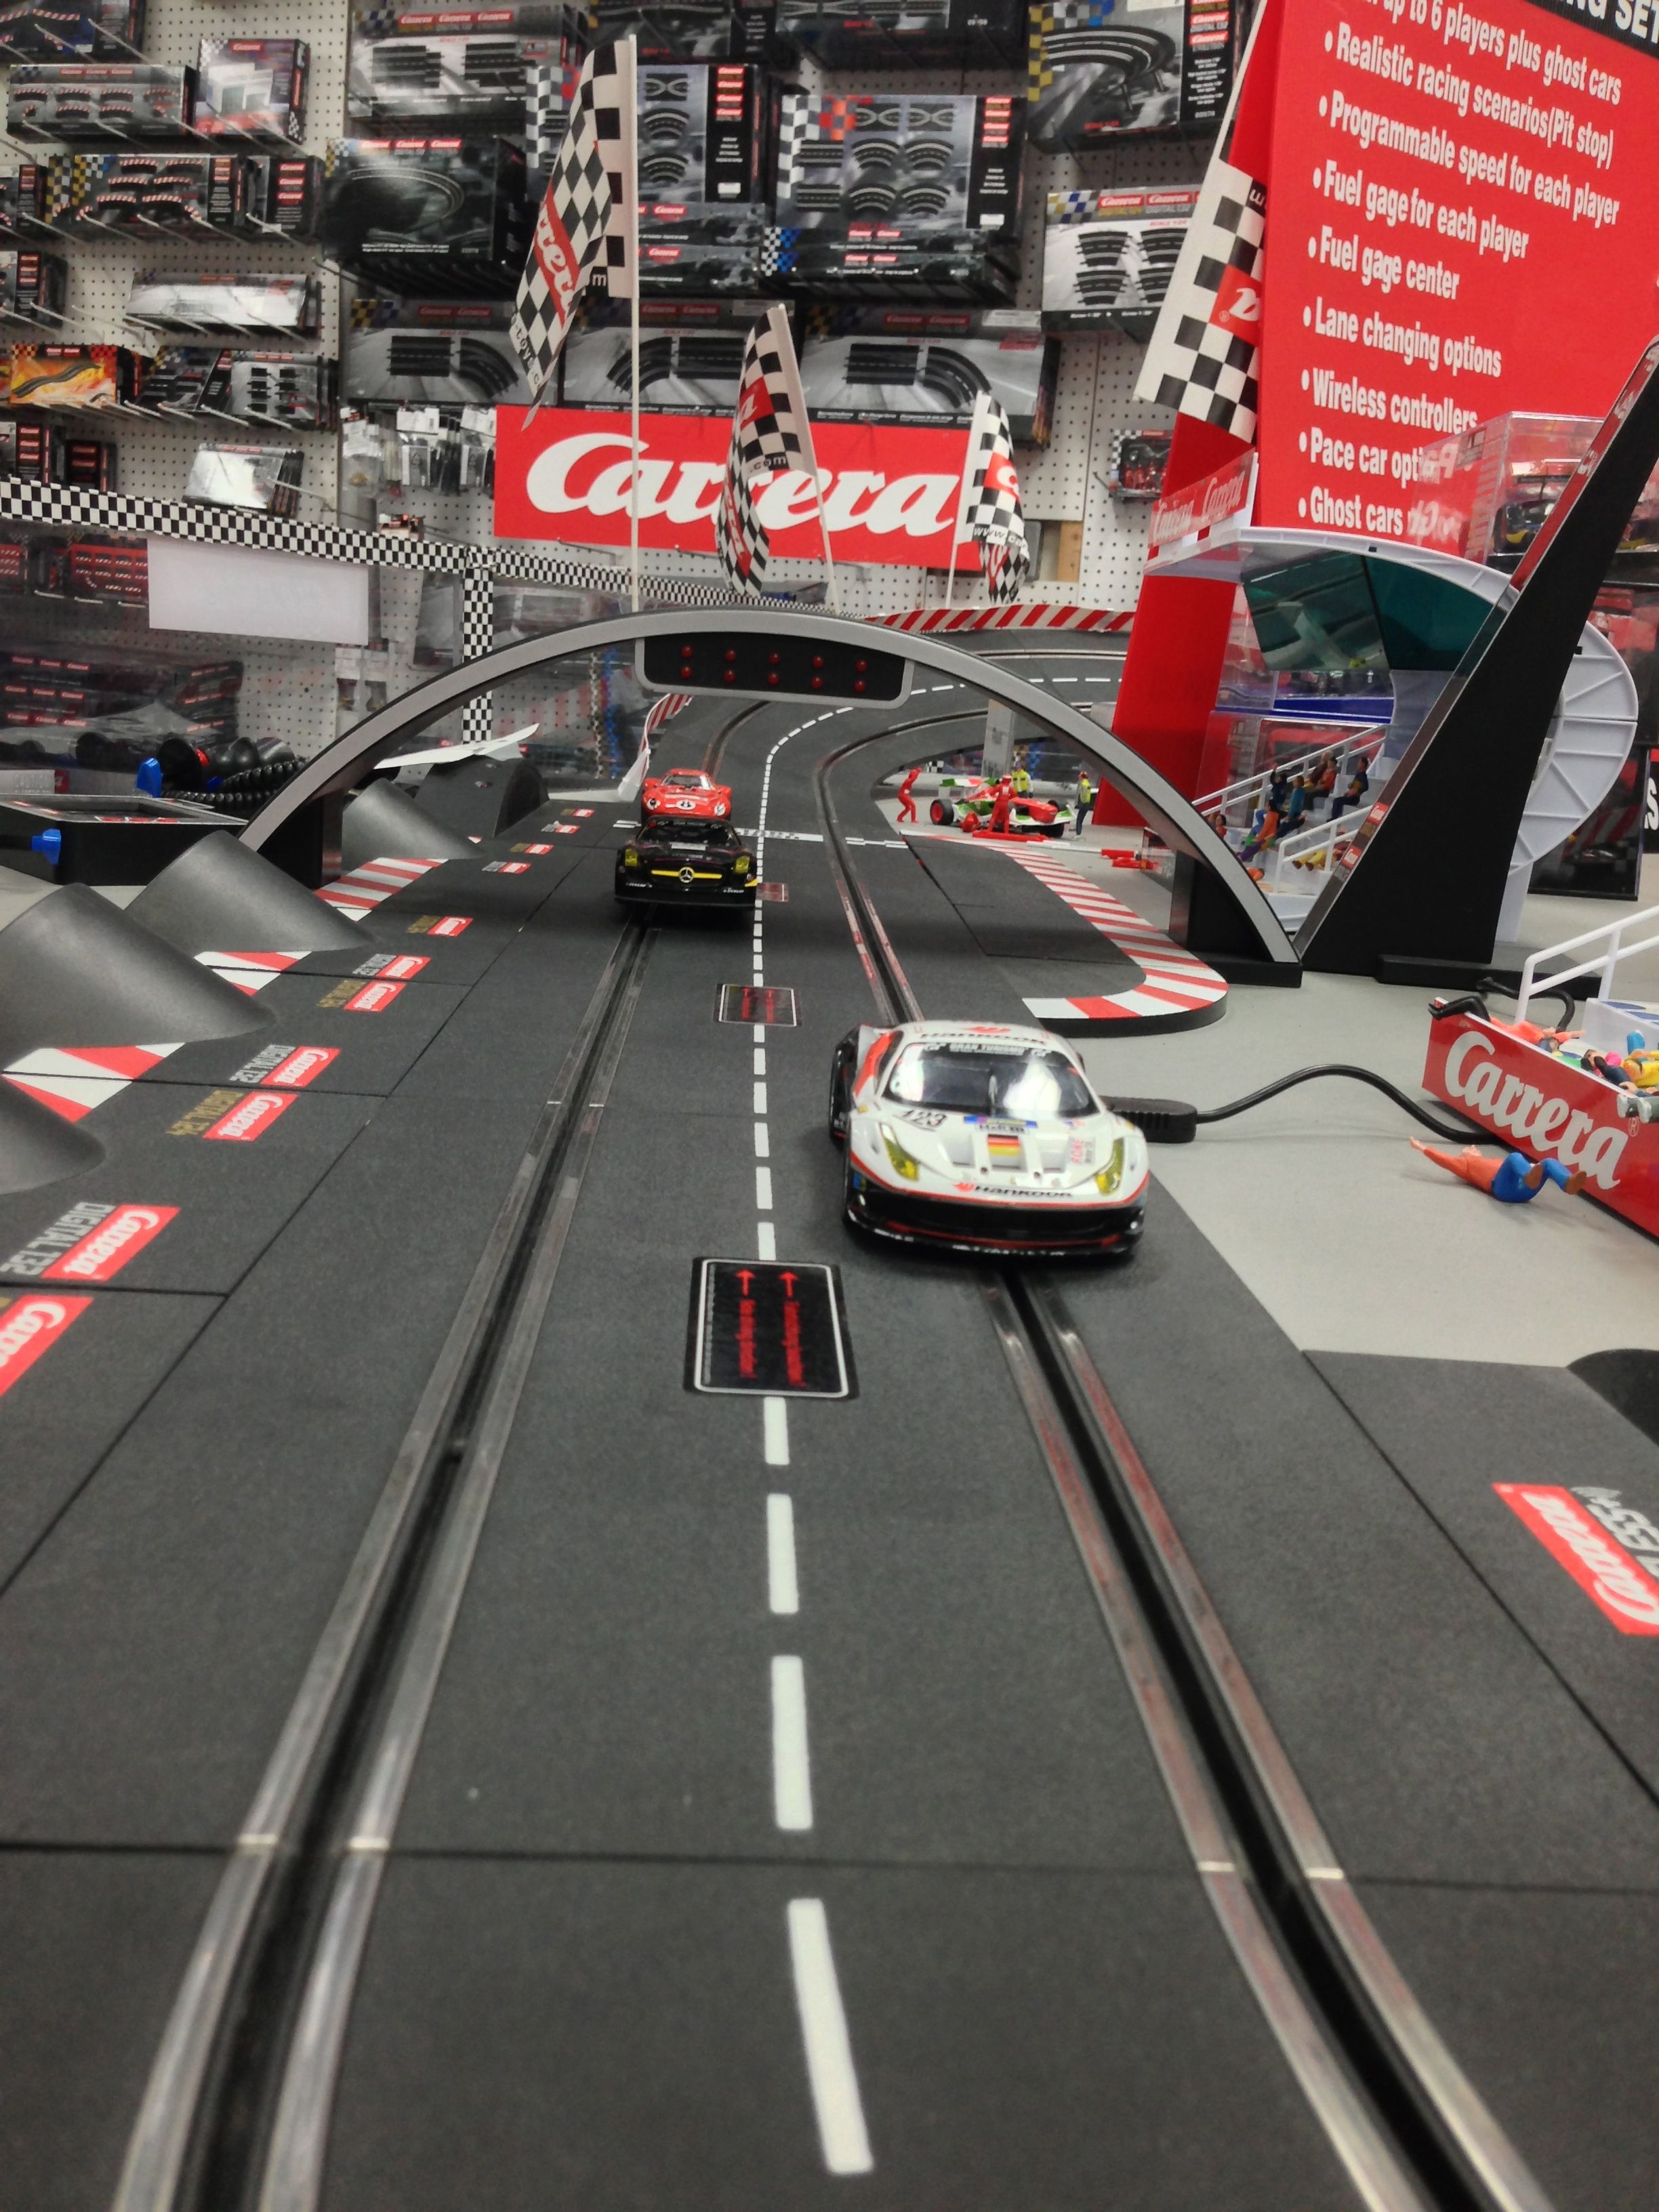 Carrera Slot Cars In The Store At Big Boys With Cool Toys Carrera Slot Cars Slot Cars Slot Car Racing